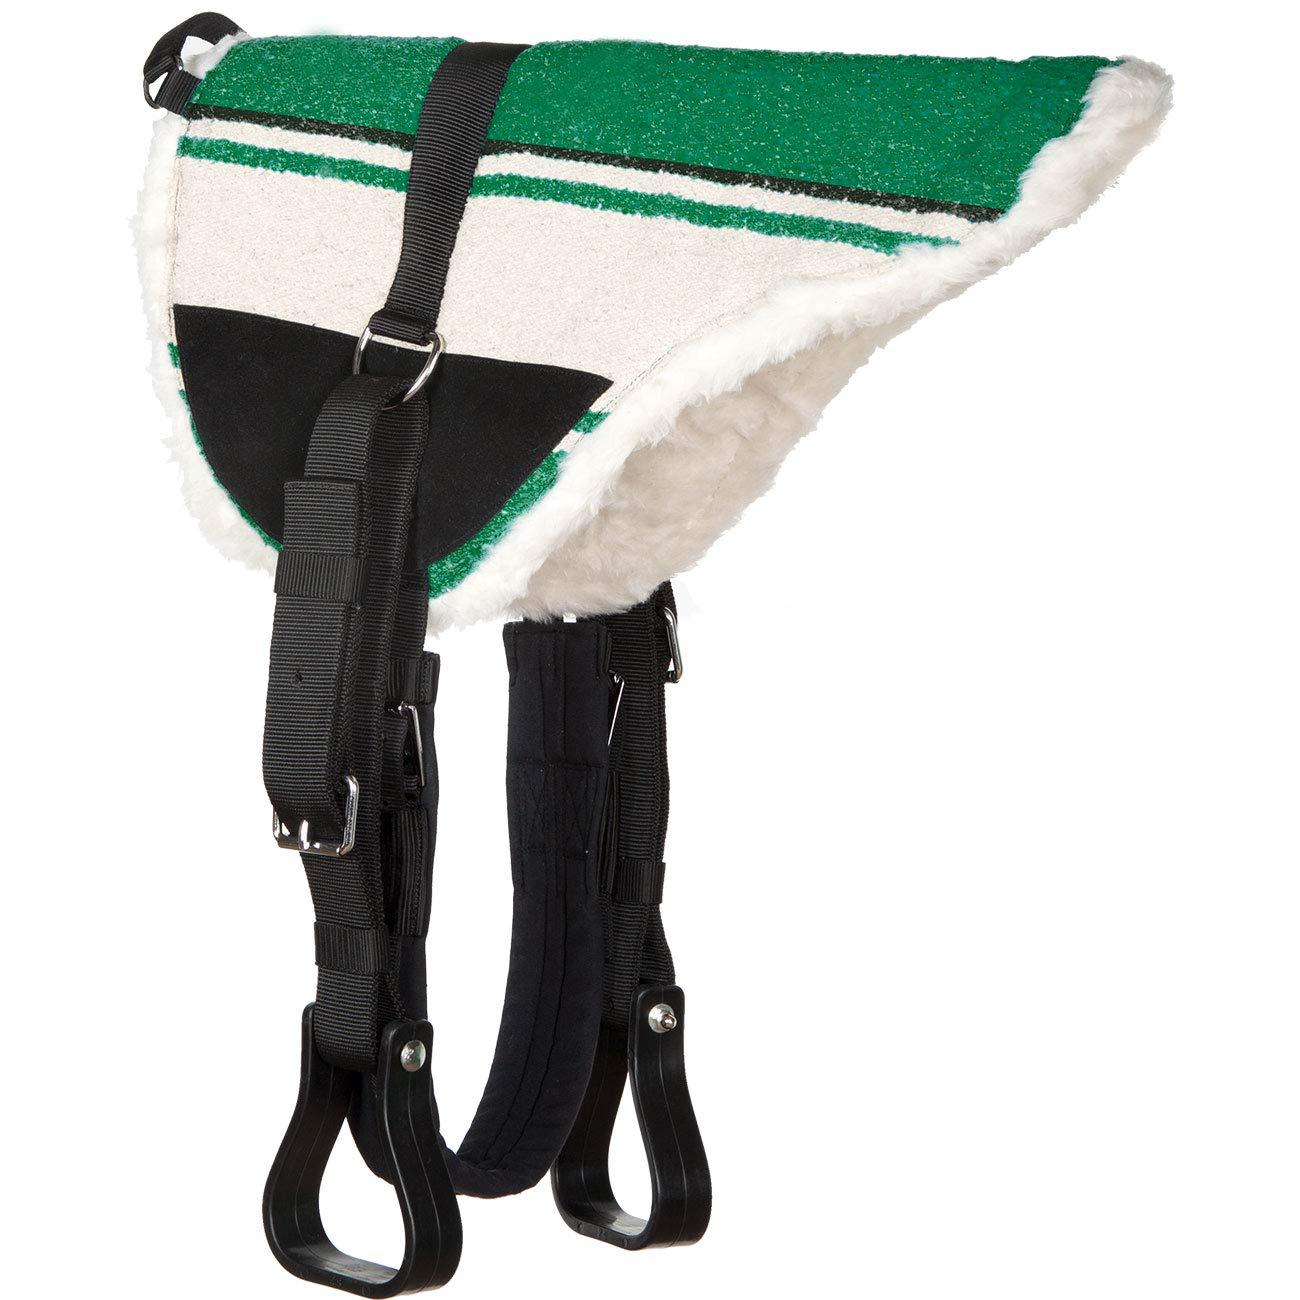 Bareback Pad komplett Heinick-Reitsport Reitkissen Reitpad Sattelkissen ~ Green ~ Shetty Pony Kleinpferd